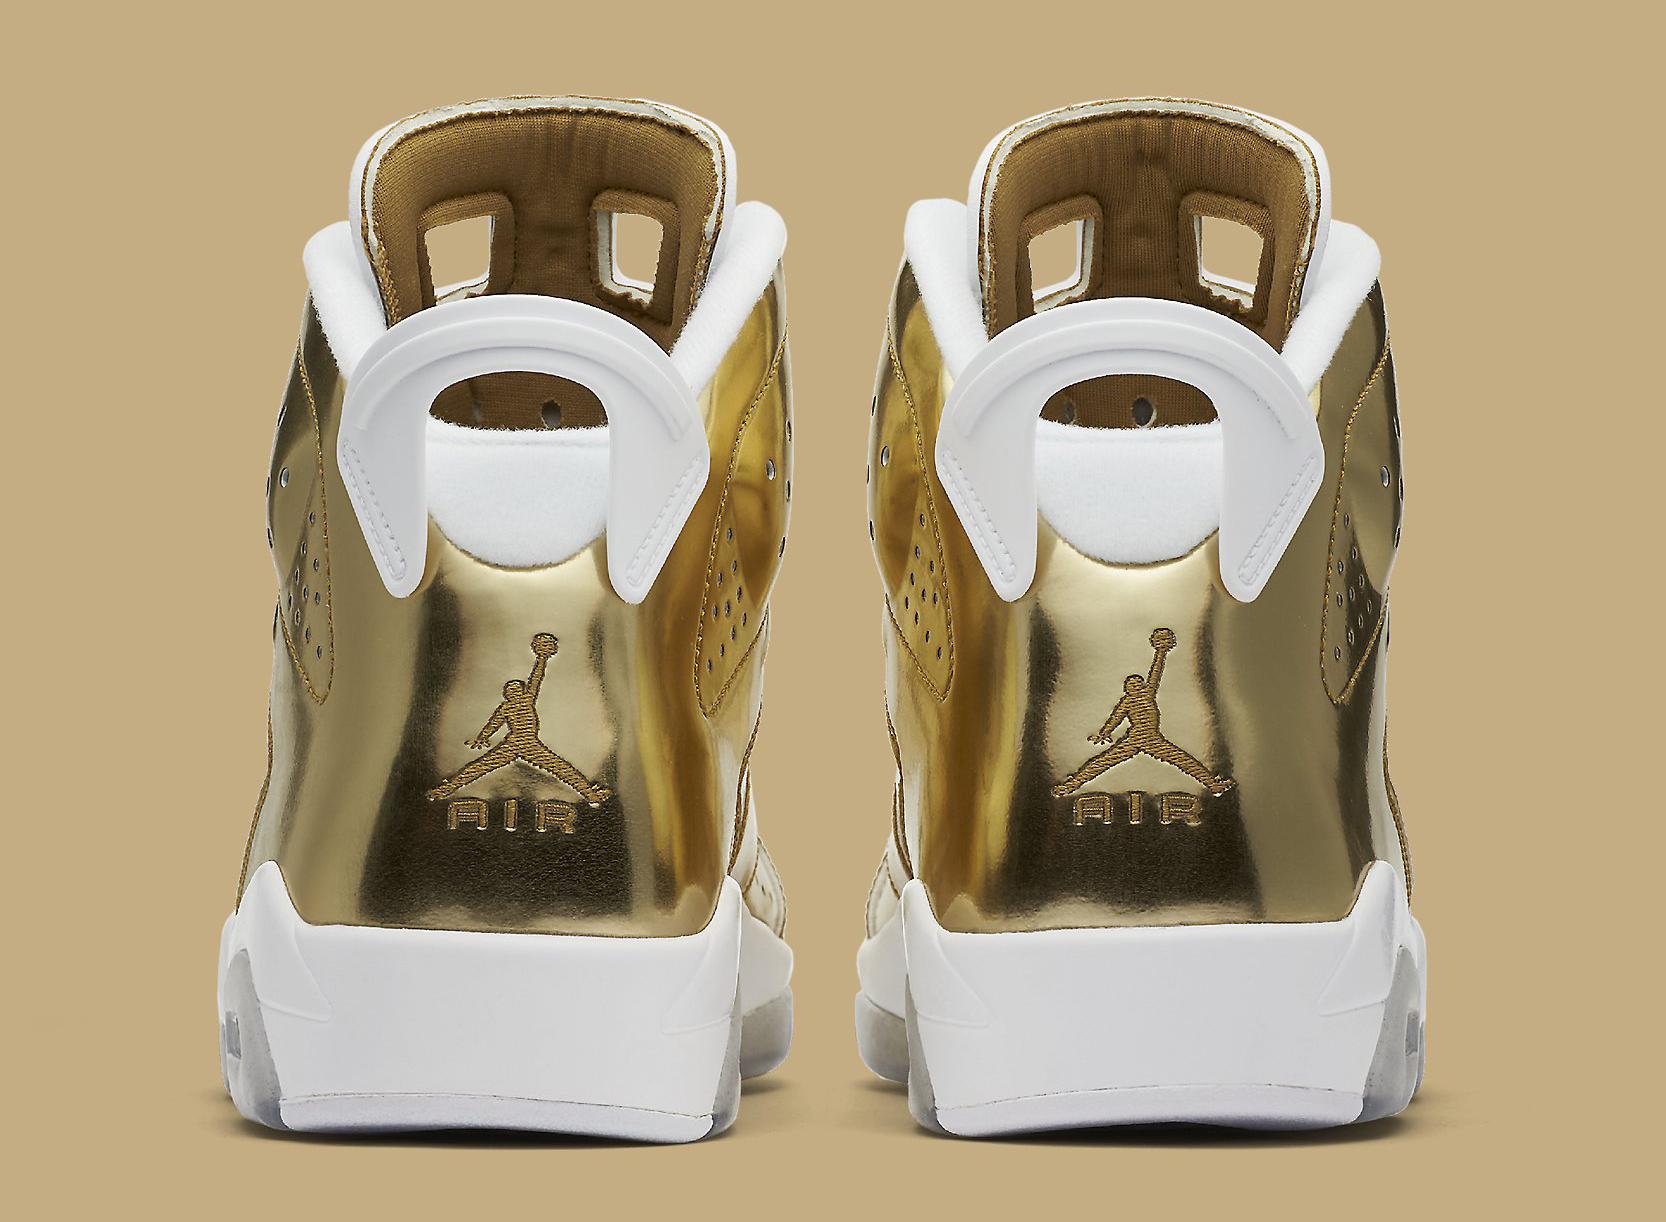 Gold Pinnacle Air Jordan 6 854271-730 Heel